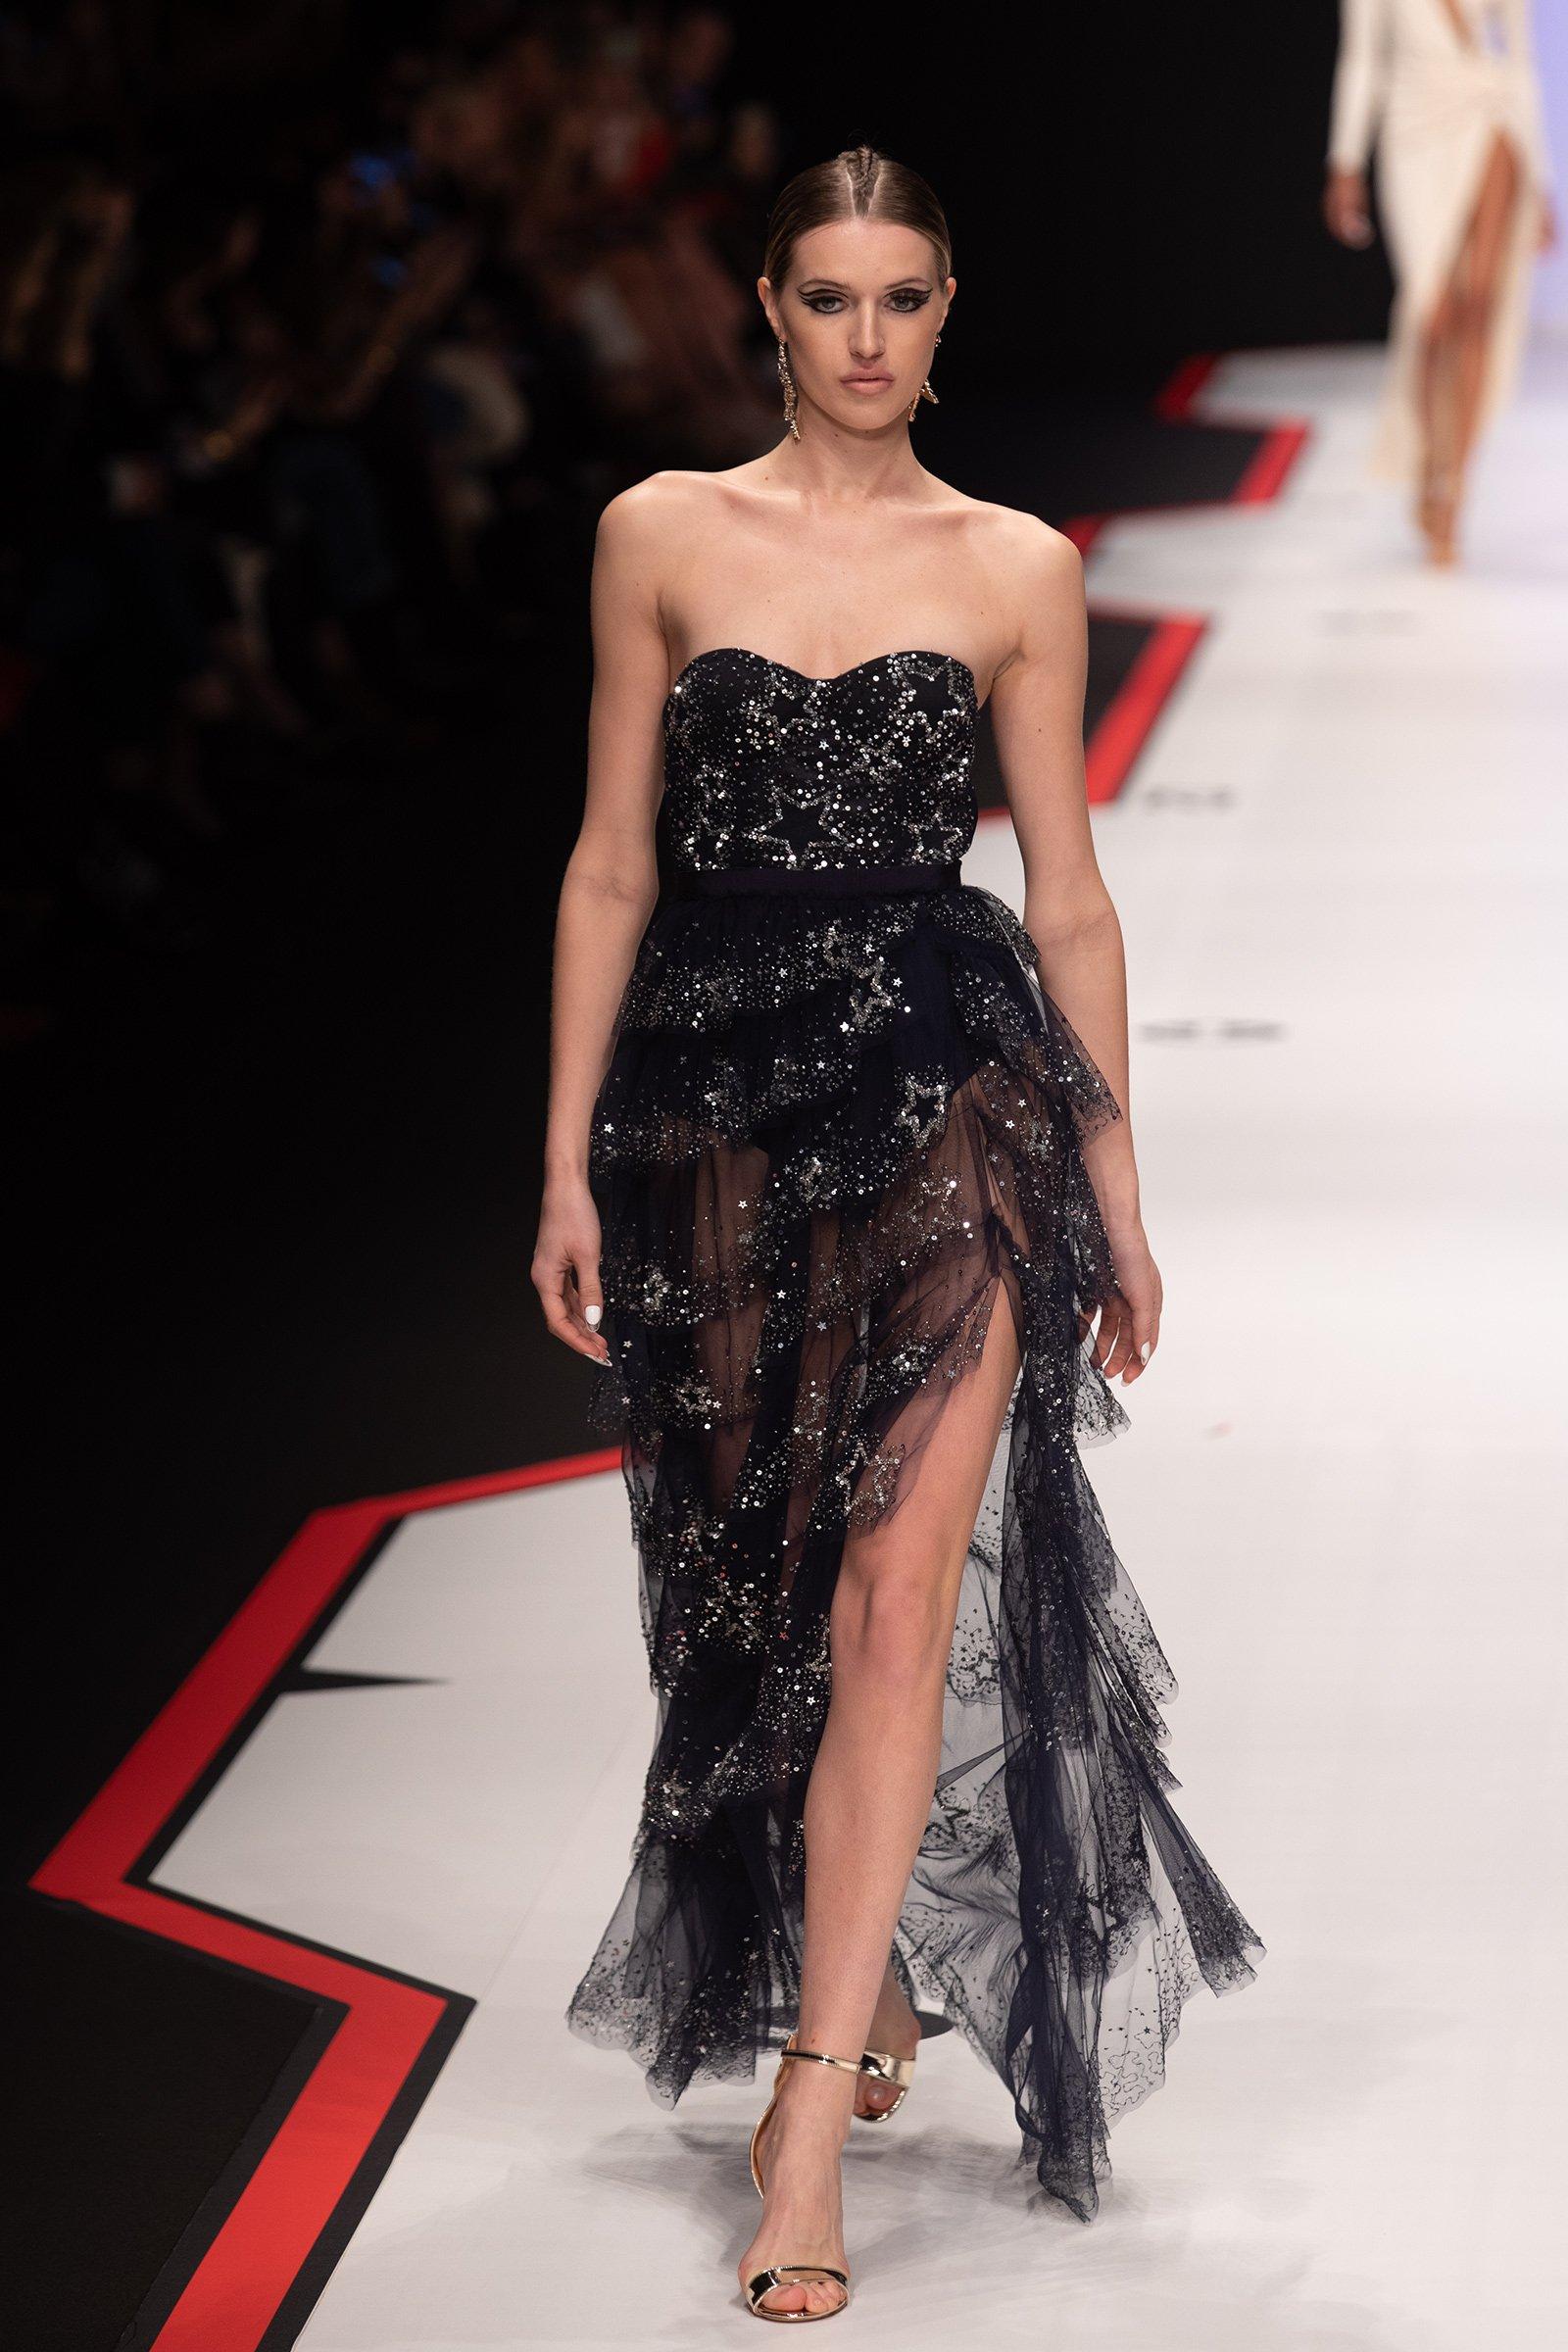 Elisabetta franche fall winter collection F/W 2019-2020 on catwalk during MilanoModaDonna - Milan Fashion Week #mfw